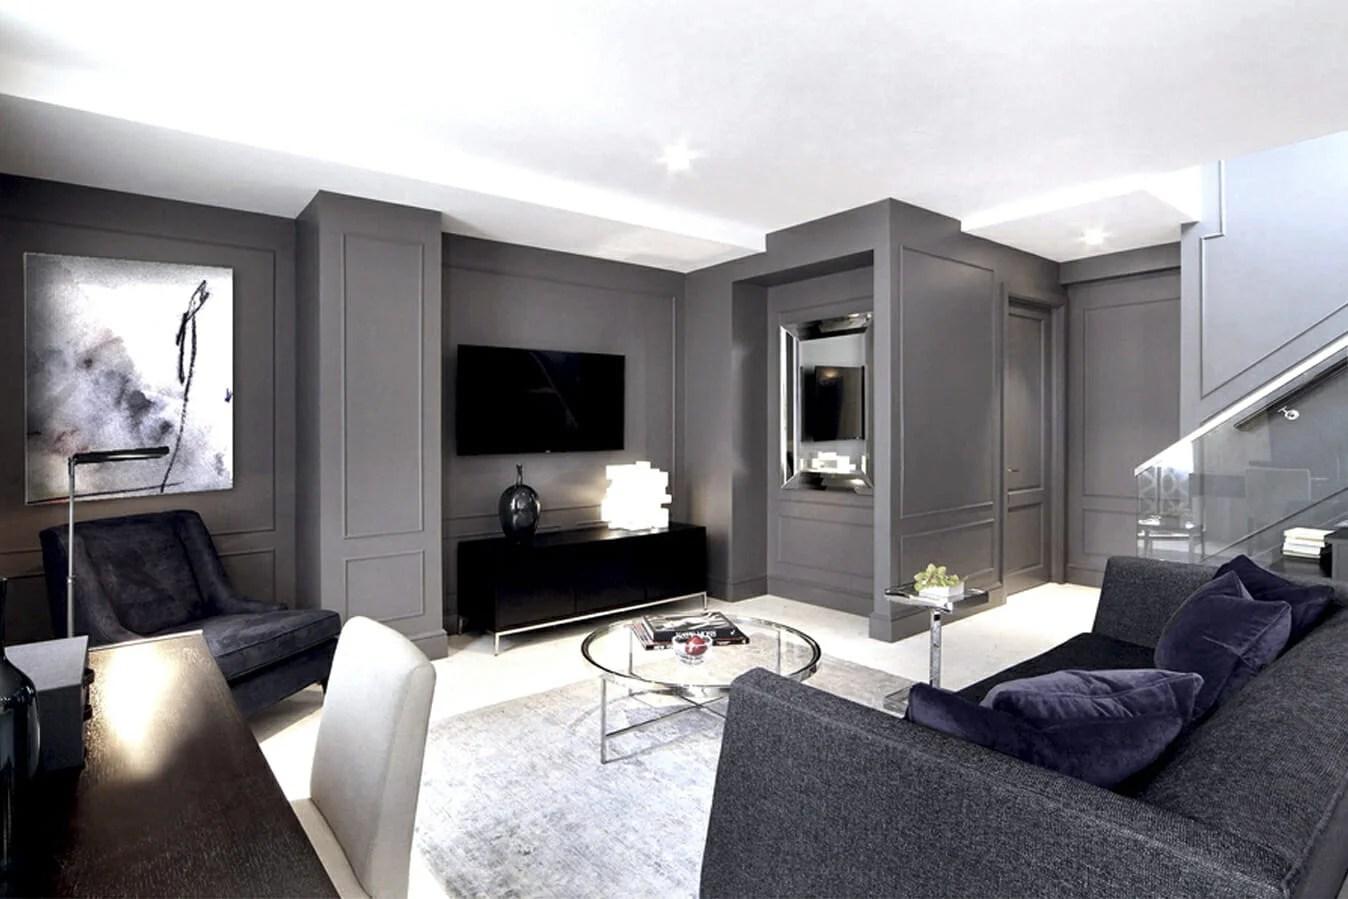 Modern Interior Design 10 Best Tips For Creating Beautiful Interiors